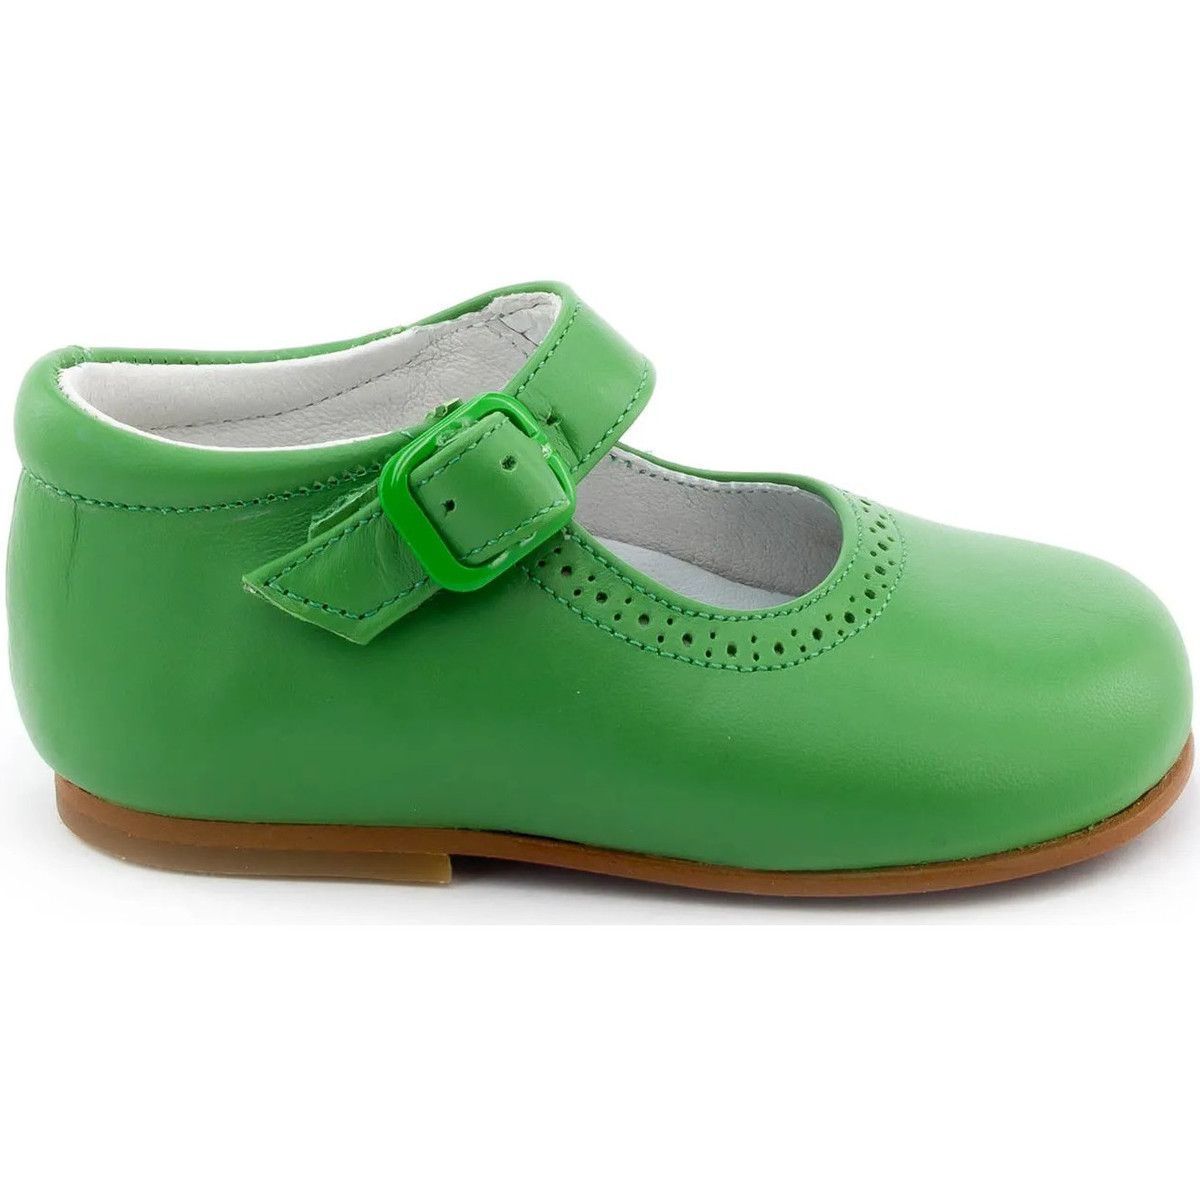 boni classic shoes boni catia chaussure fille premiers. Black Bedroom Furniture Sets. Home Design Ideas